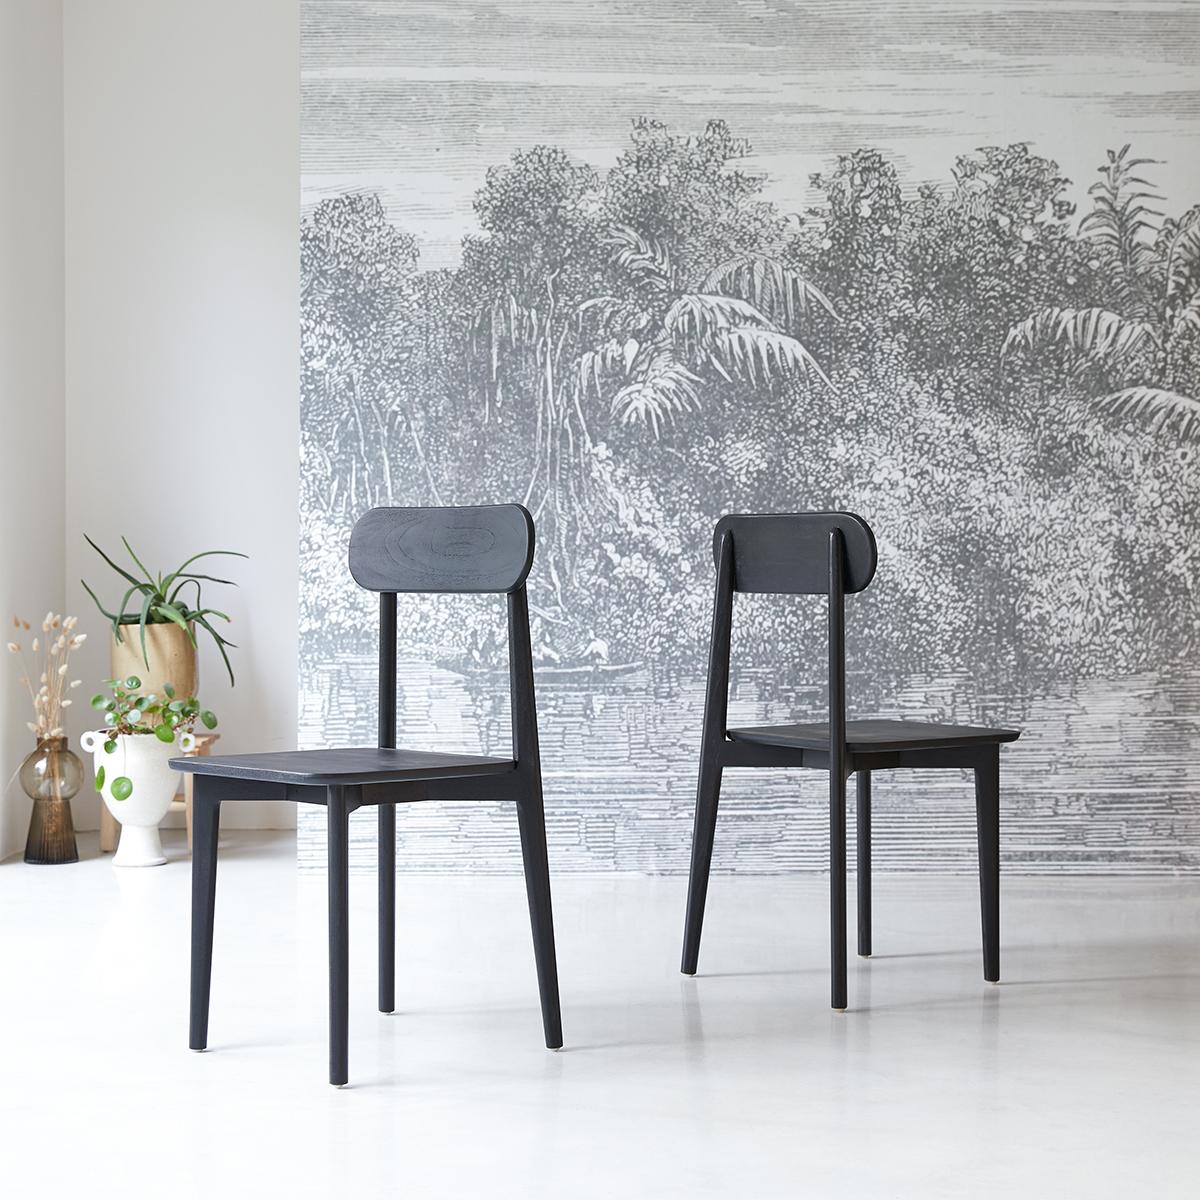 Jonàk black solid teak Chair